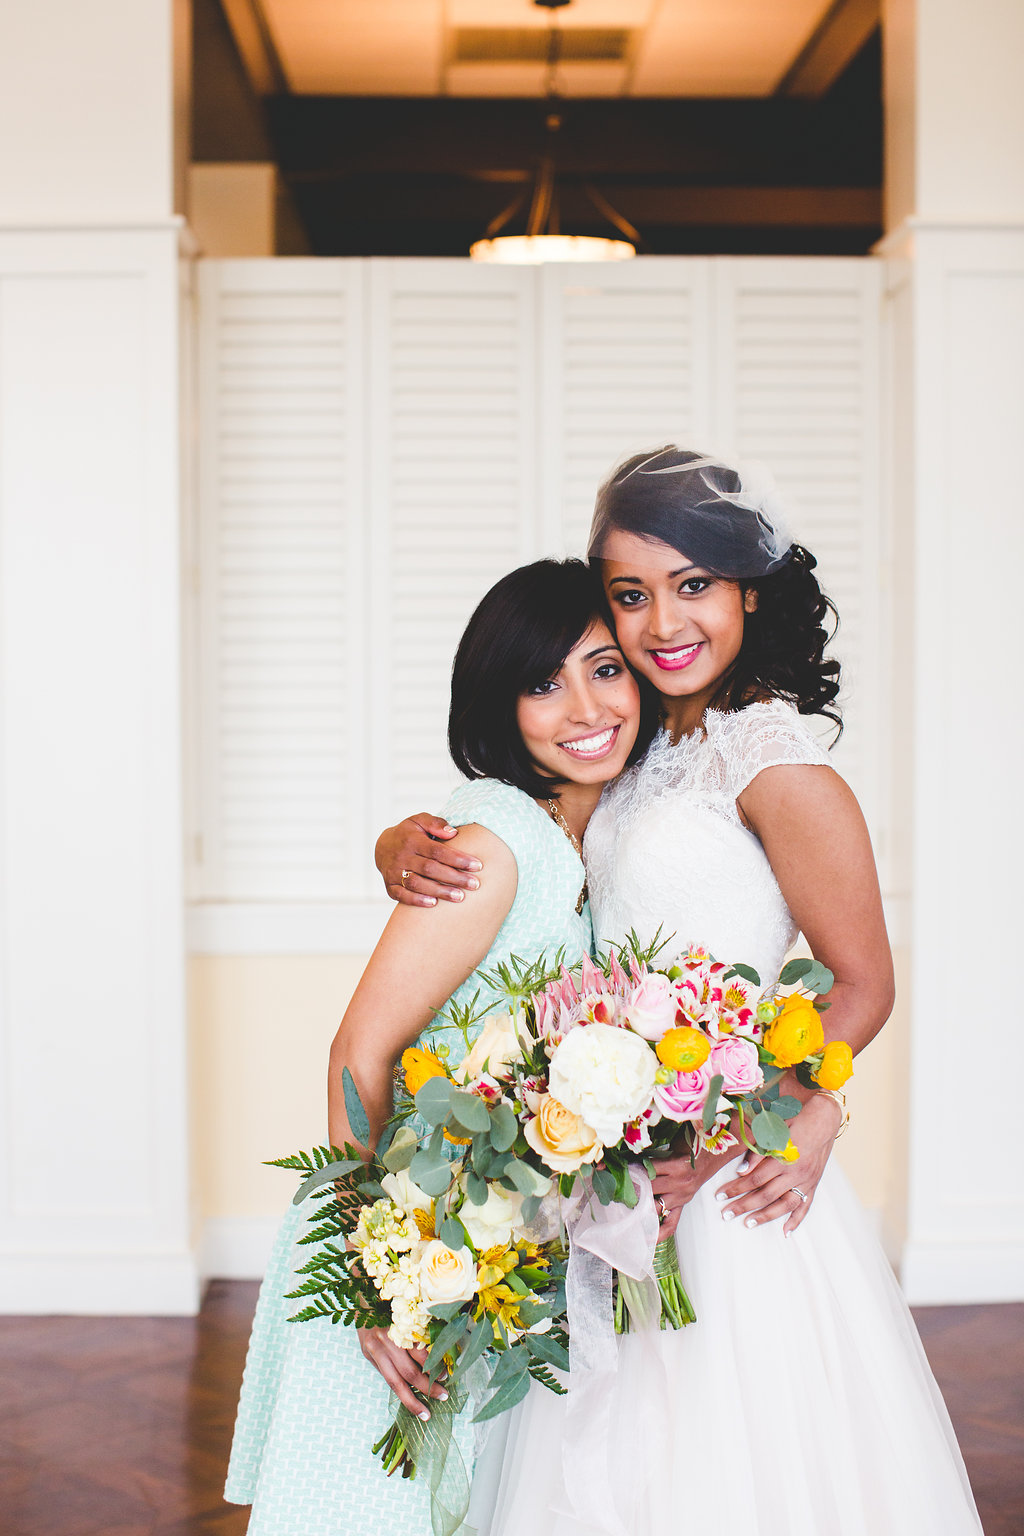 wedding-party-bouquet-vivid-yellow-white.jpg